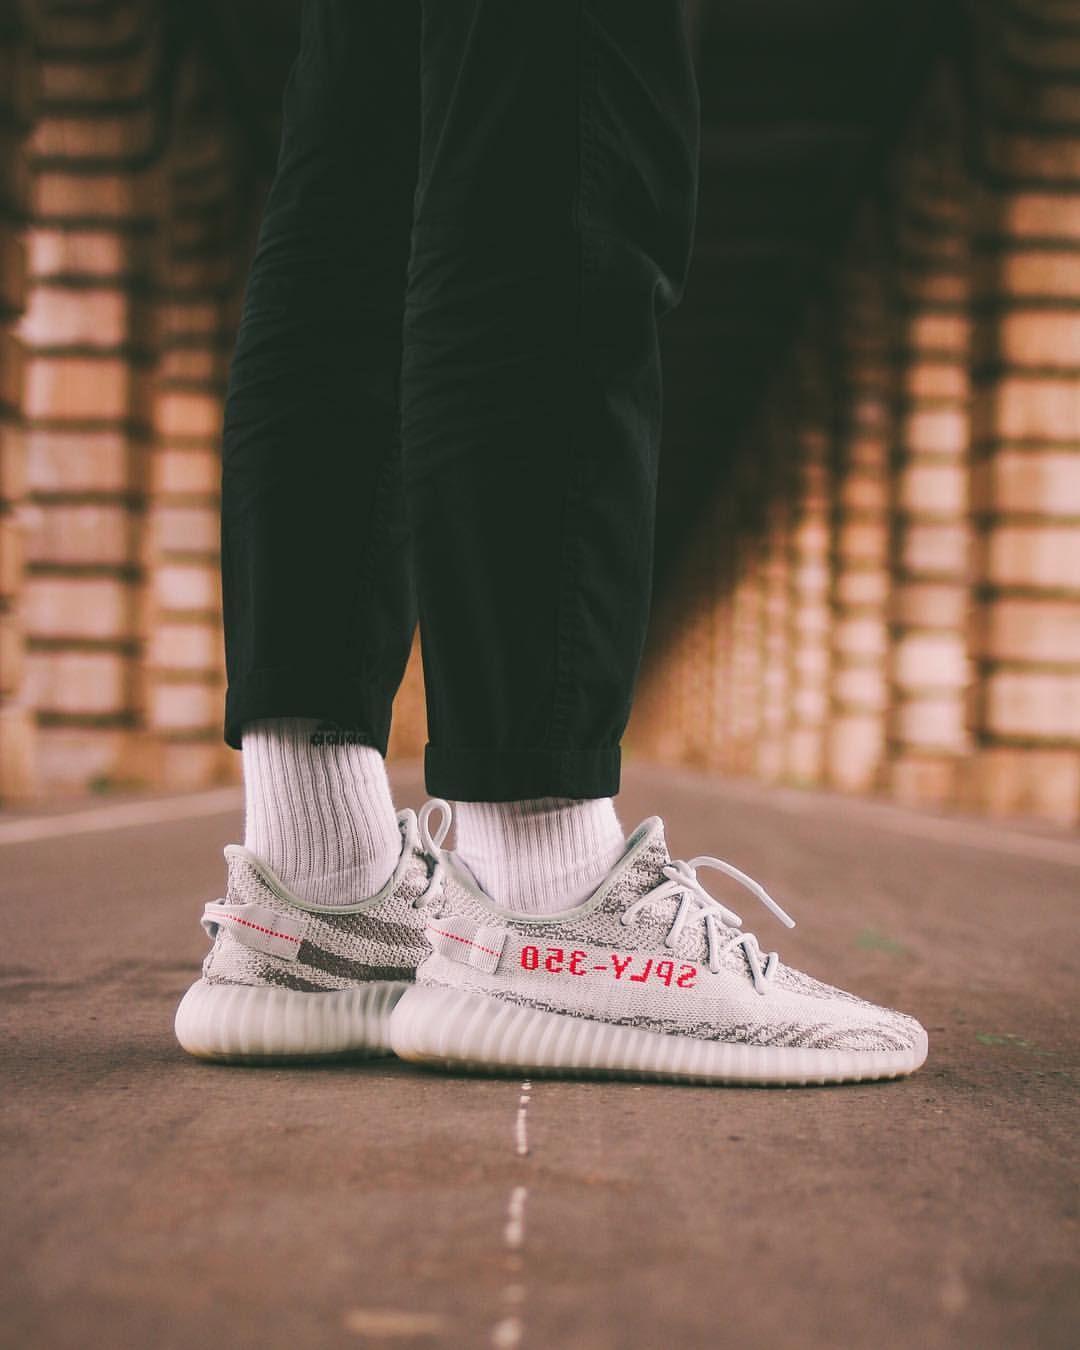 Kanye West X Adidas Yeezy Boost 350 V2 Blue Tint Sneakers Men Fashion Adidas Yeezy Adidas Yeezy Boost